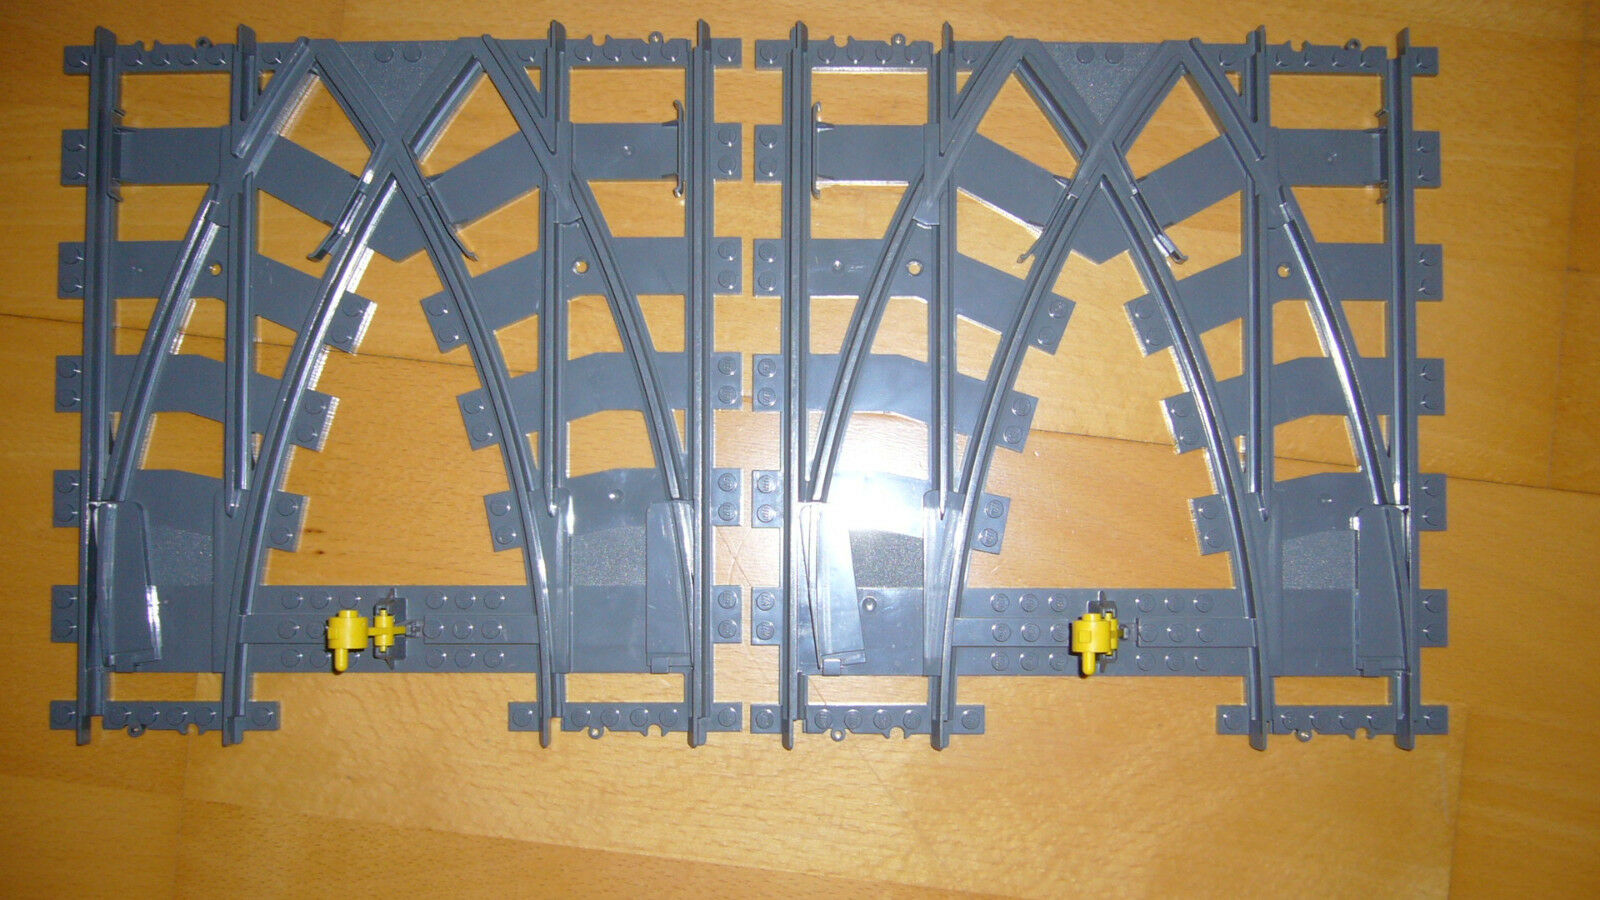 Lego 7996 tecnología City ferrocarril doble suaves cruz suaves cruce switch World